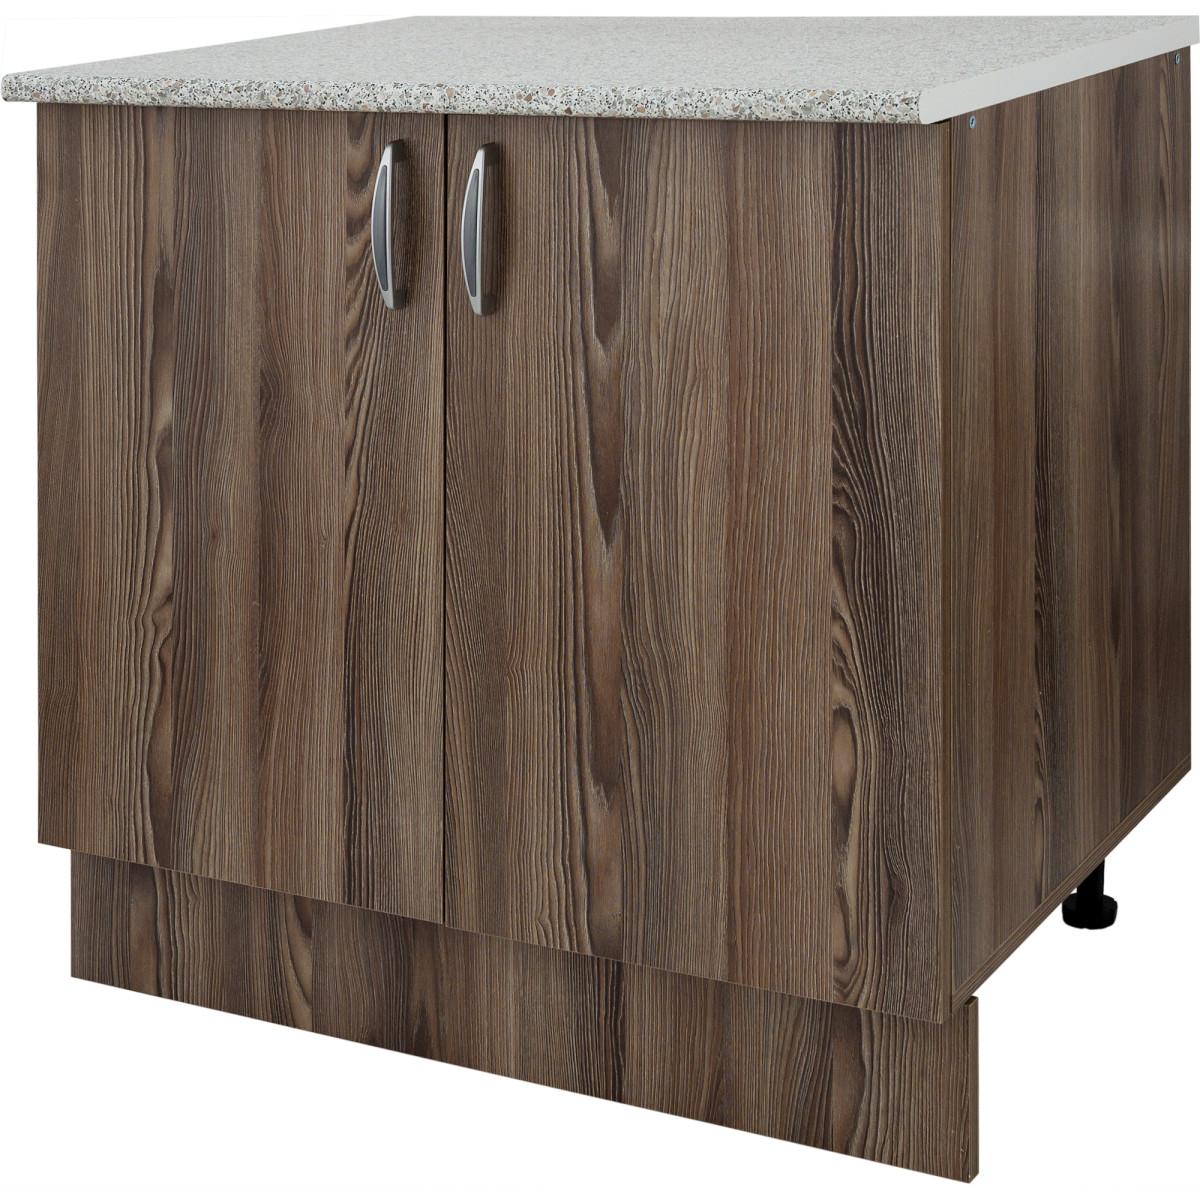 Шкаф напольный Дуб шато Сп 85х80 см цвет дуб